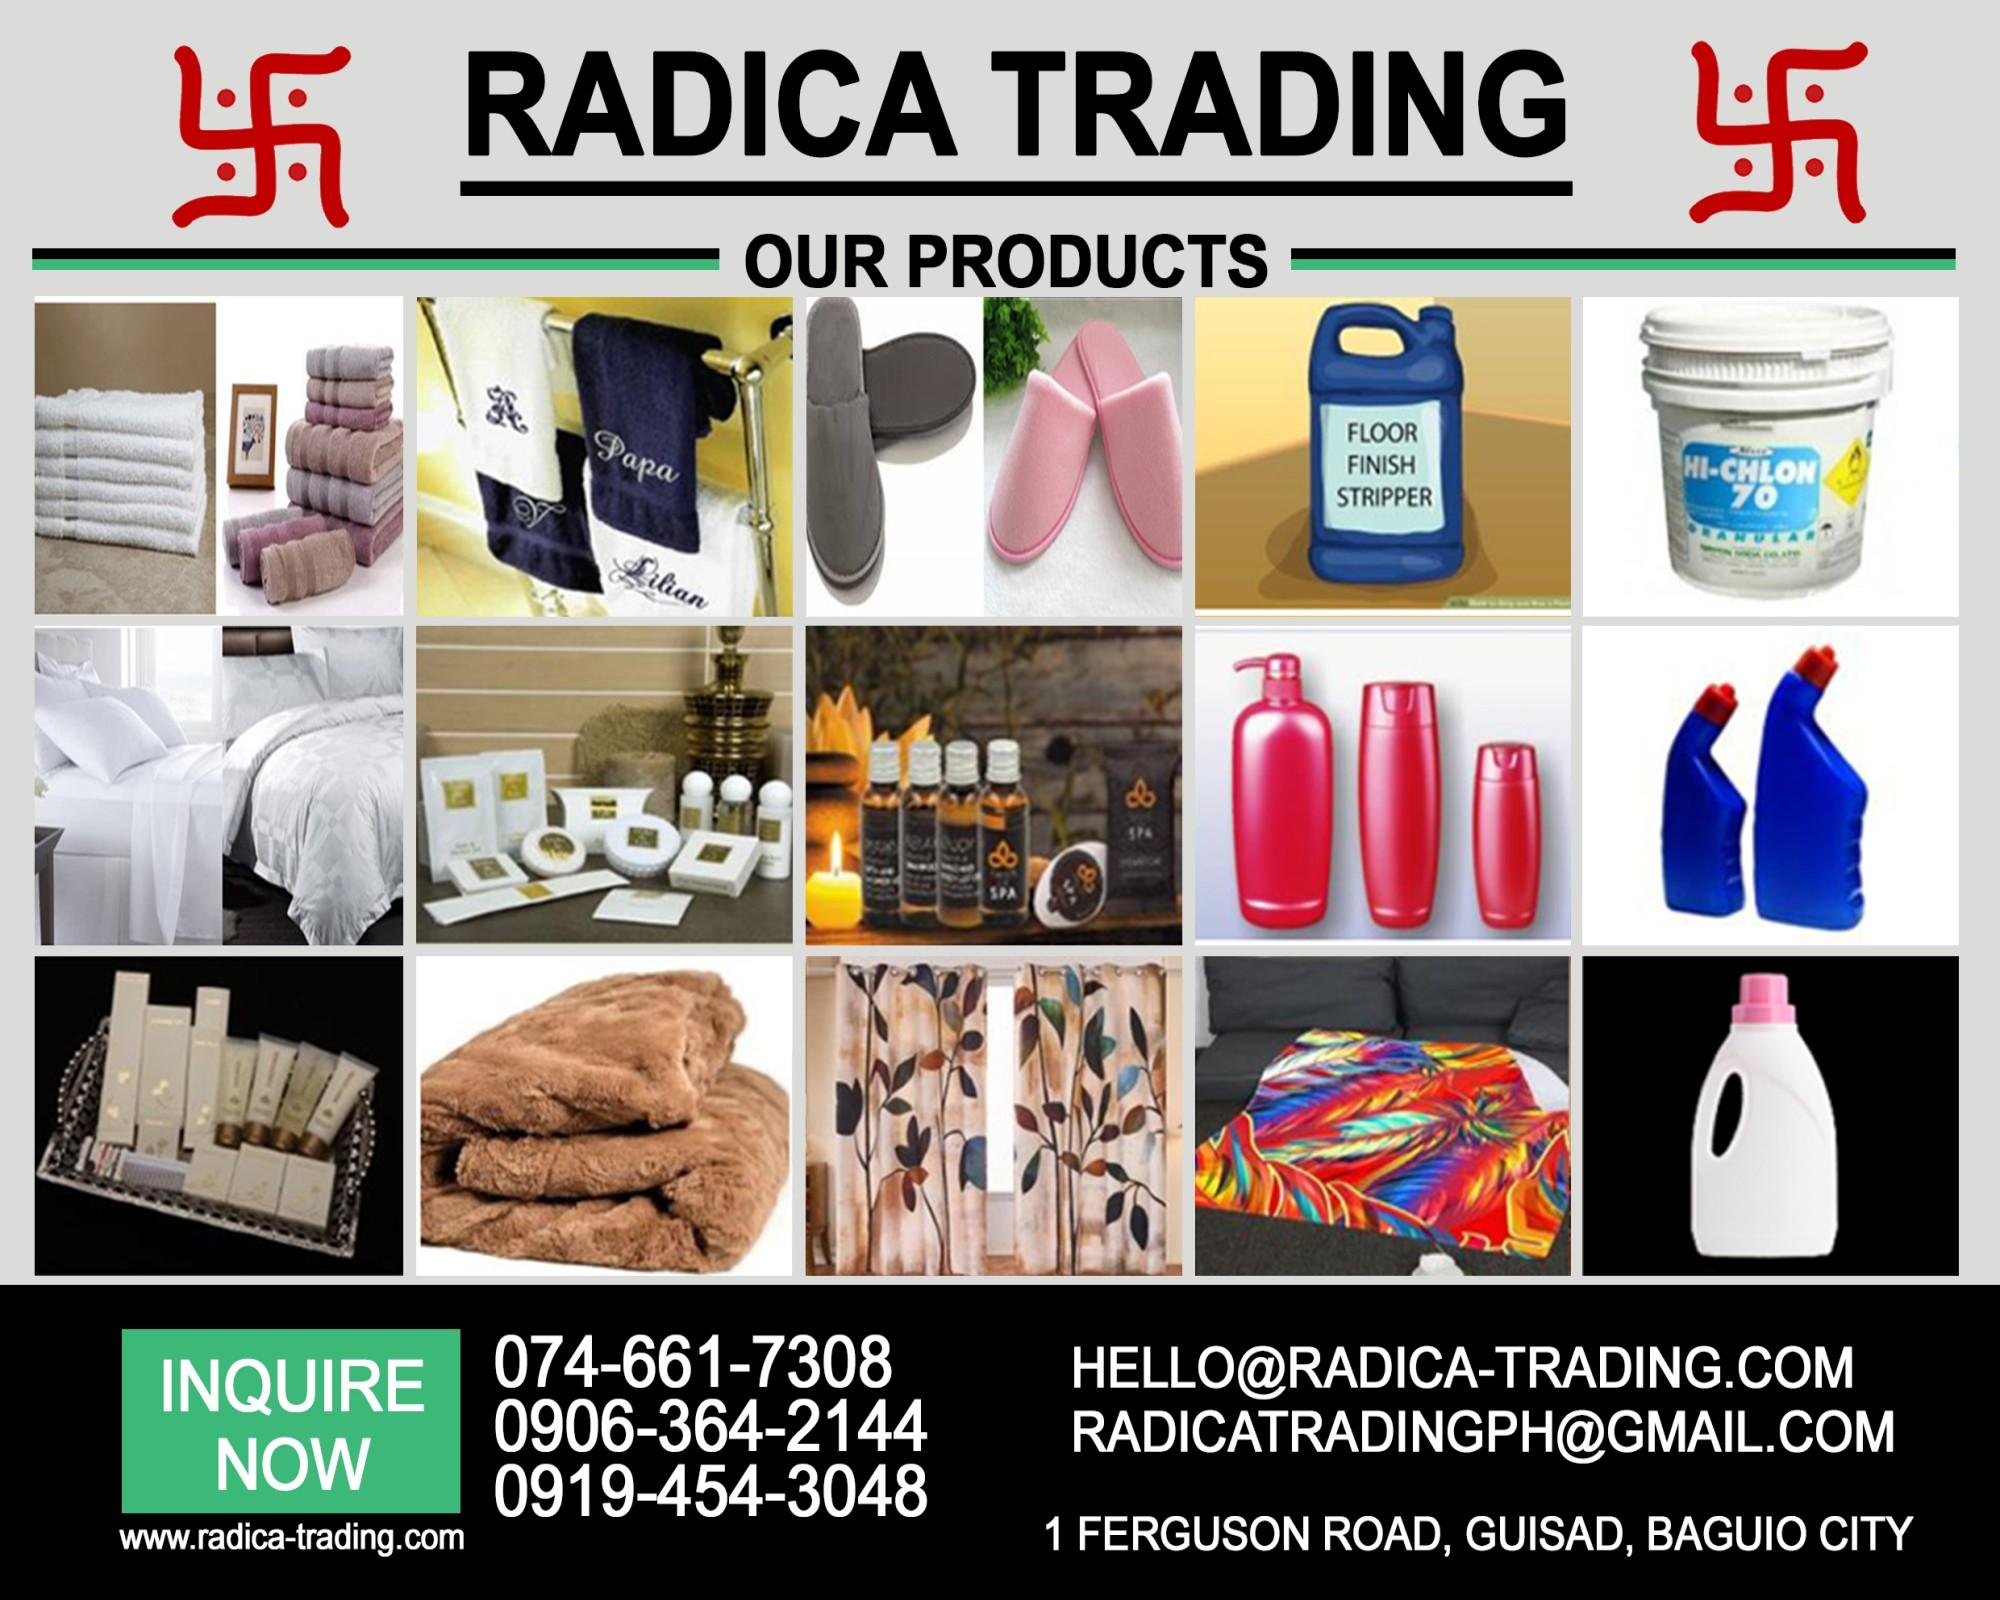 Radica Trading